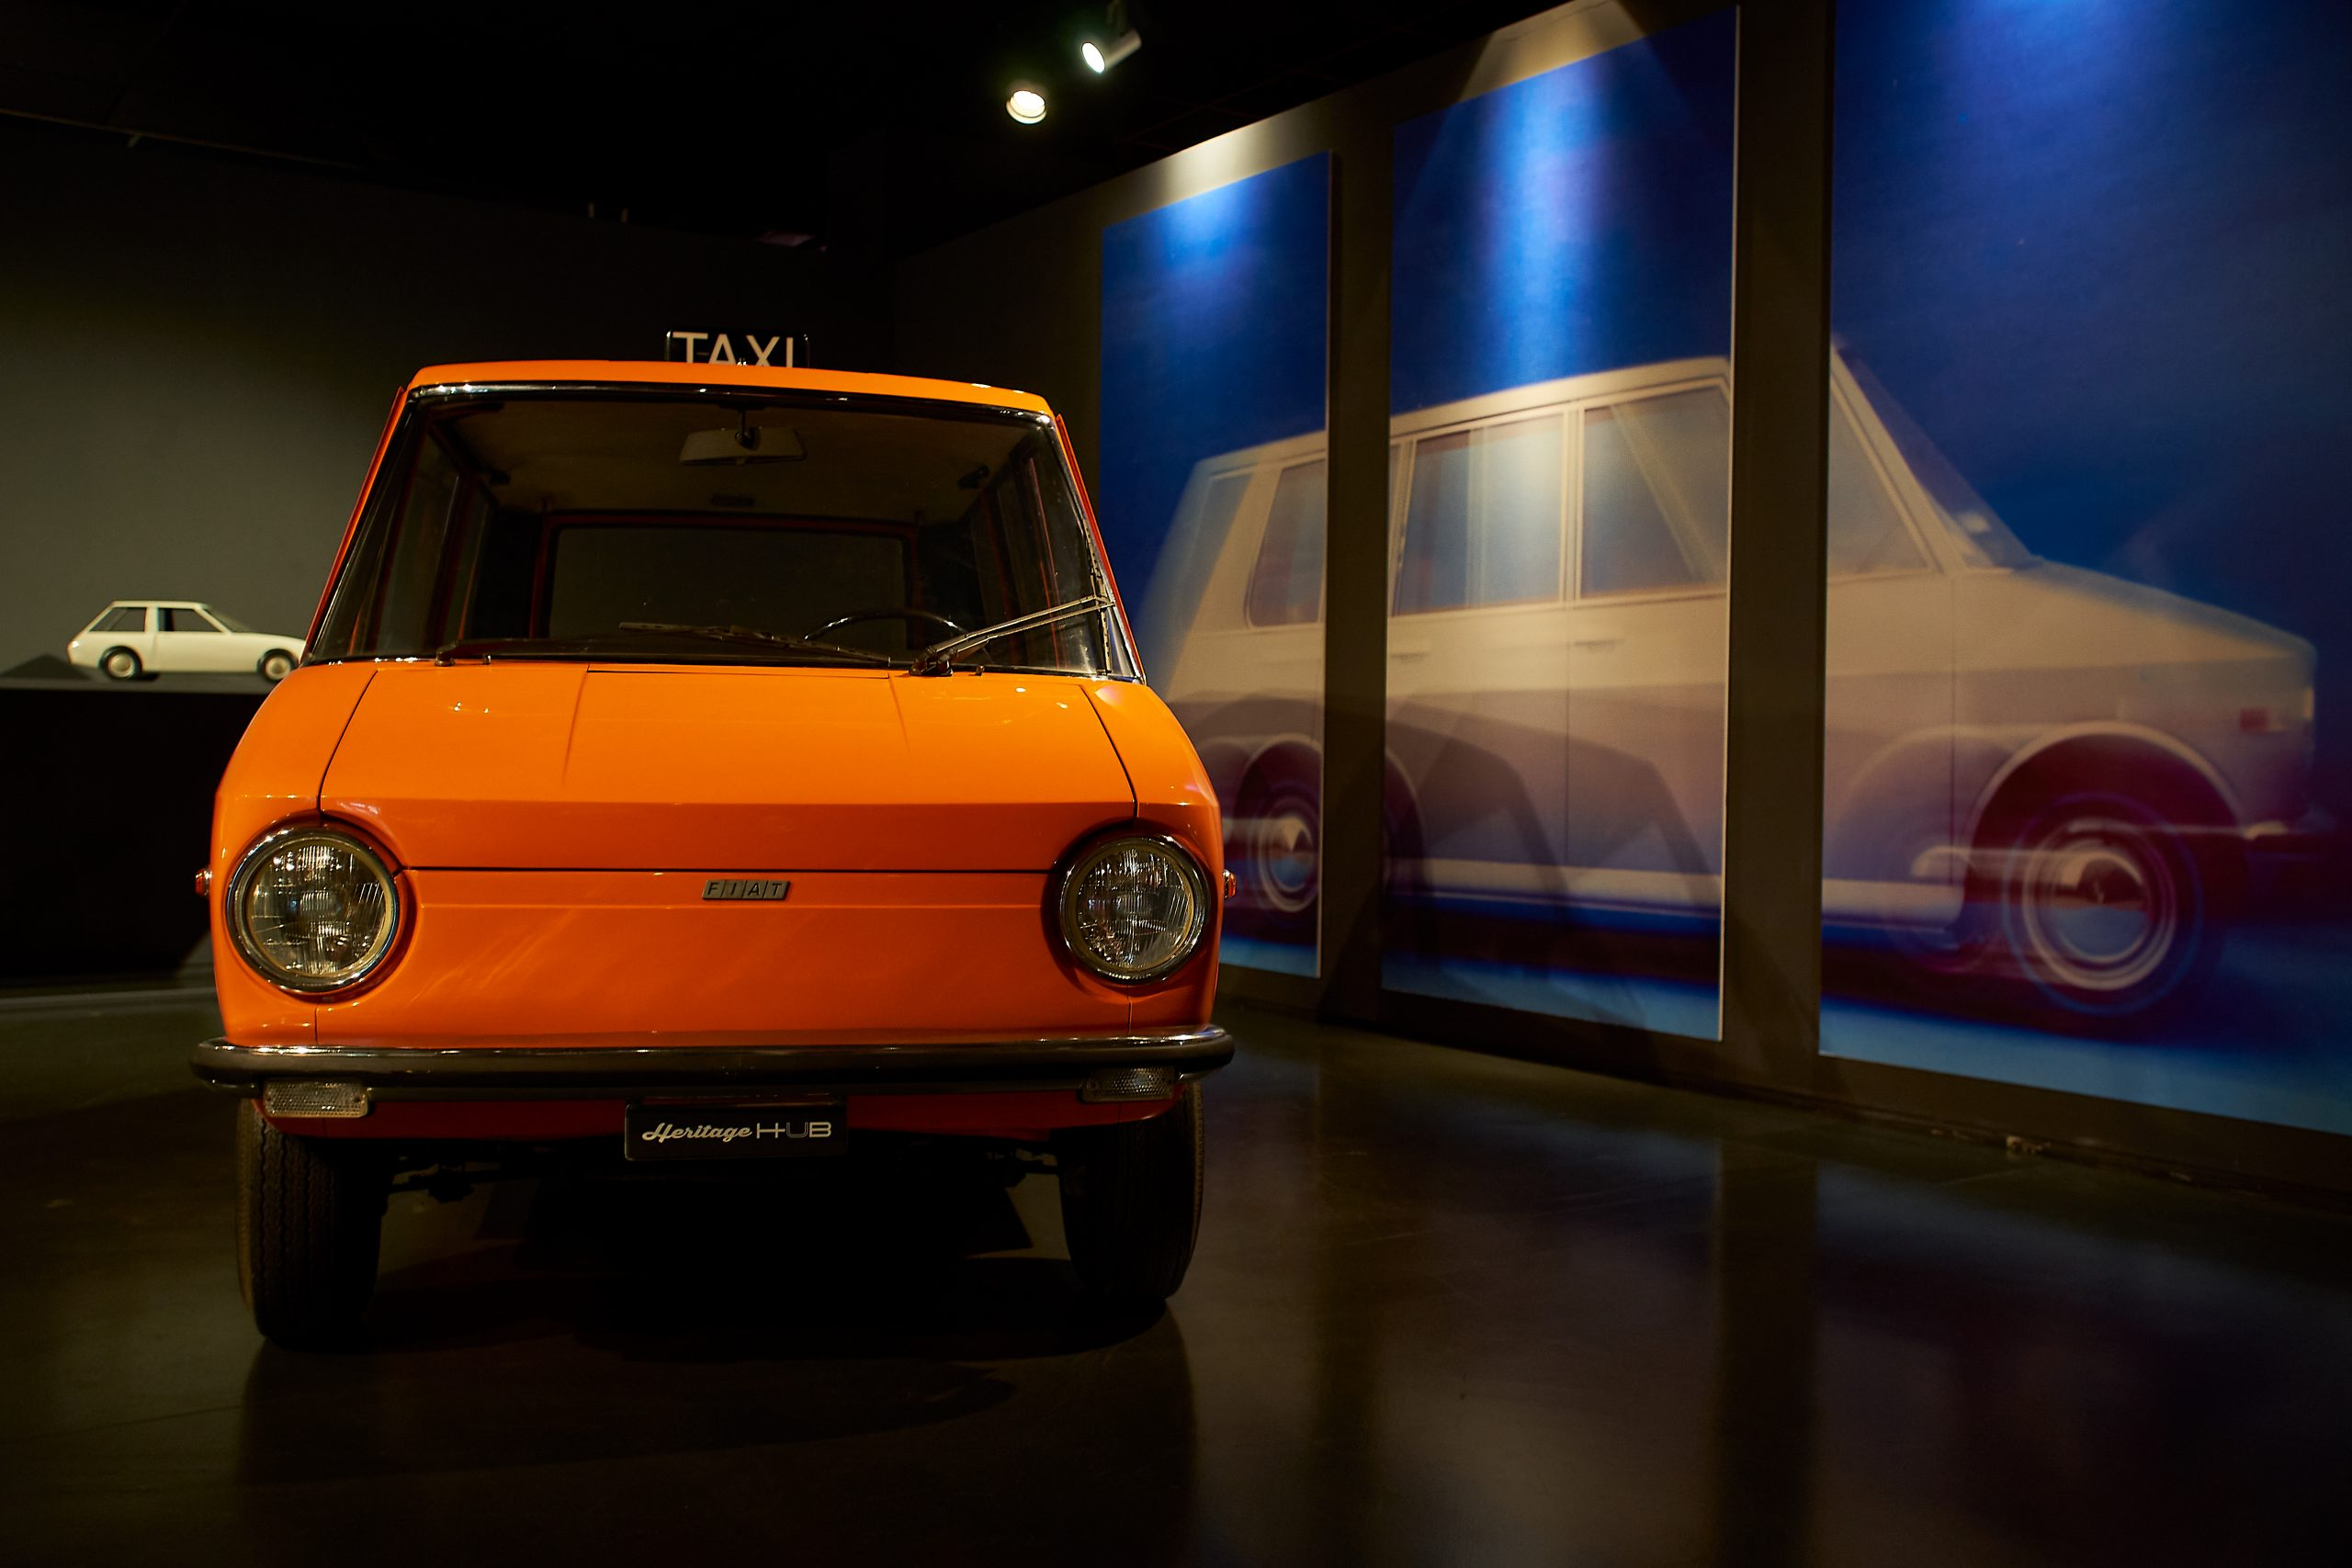 03 Fiat City Taxi scaled H Fiat, o ιδιοφυής σχεδιαστής και ένα περίεργο ταξί Fiat, retro, ειδήσεις, Νέα